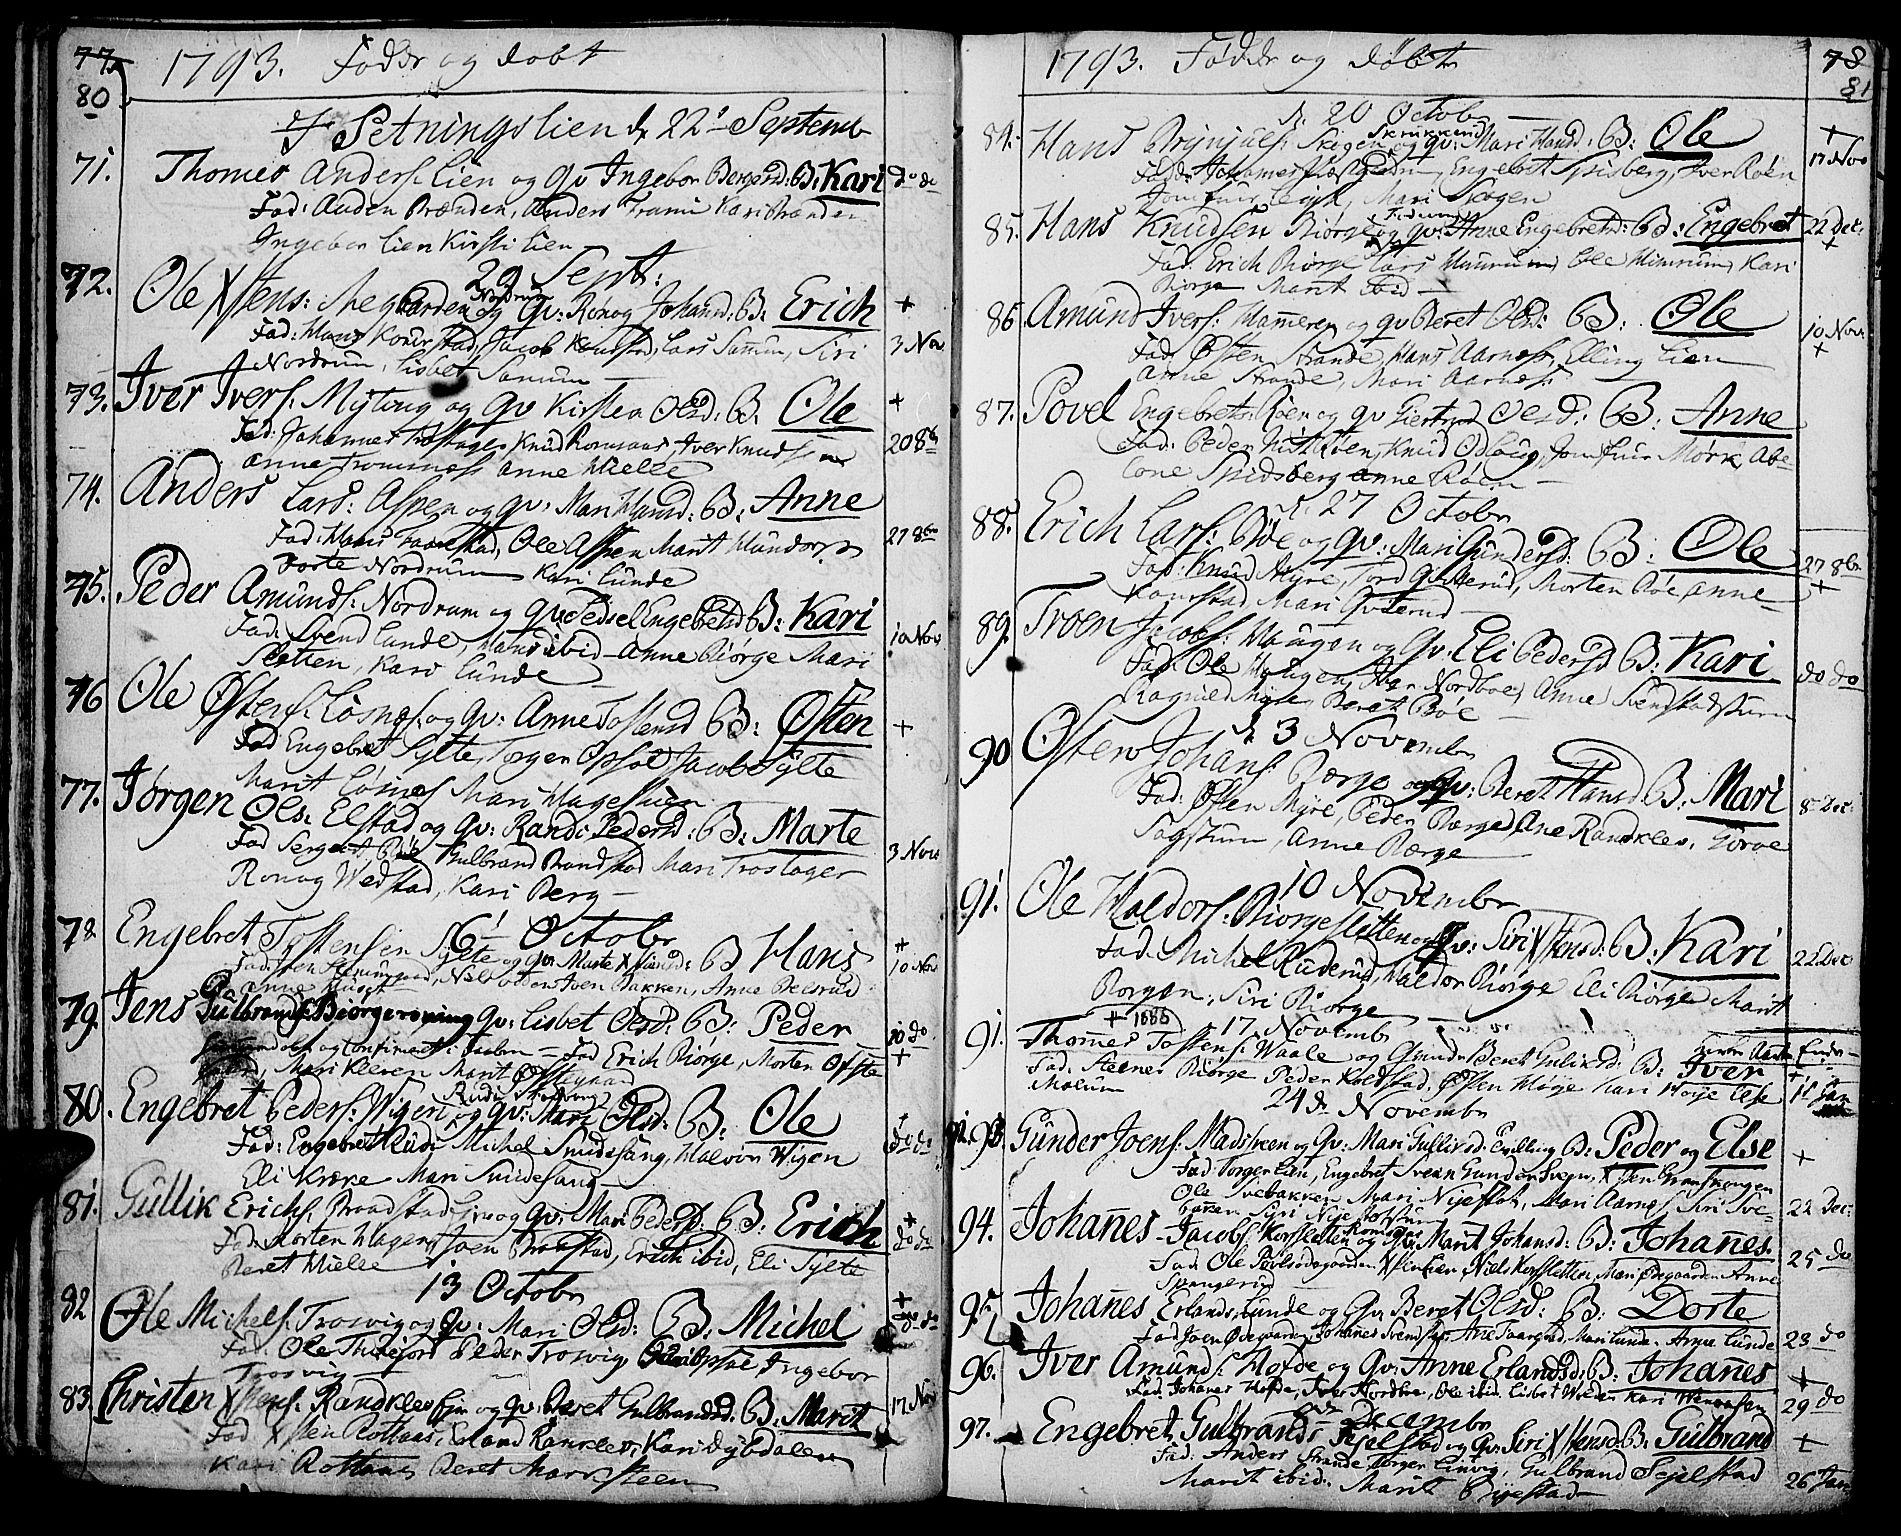 SAH, Ringebu prestekontor, Ministerialbok nr. 3, 1781-1820, s. 80-81